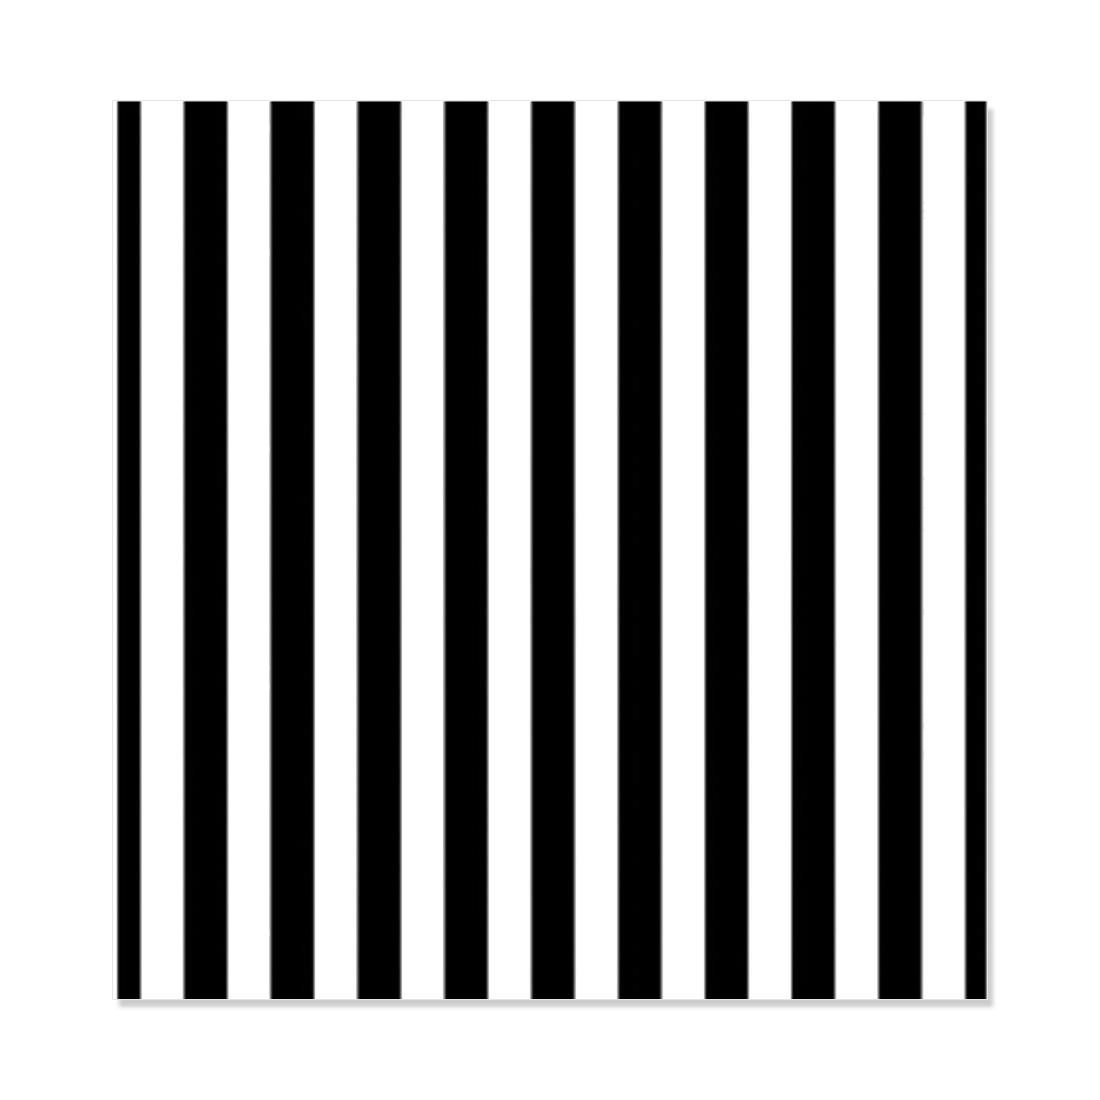 HOT-8x8FT Vinyl Black White Stripes Backdrop Photography Background Studio Props 8x8ft black white stripes wall custom vinyl photography background studio photo prop photographic backdrop 2 4m x 2 4m